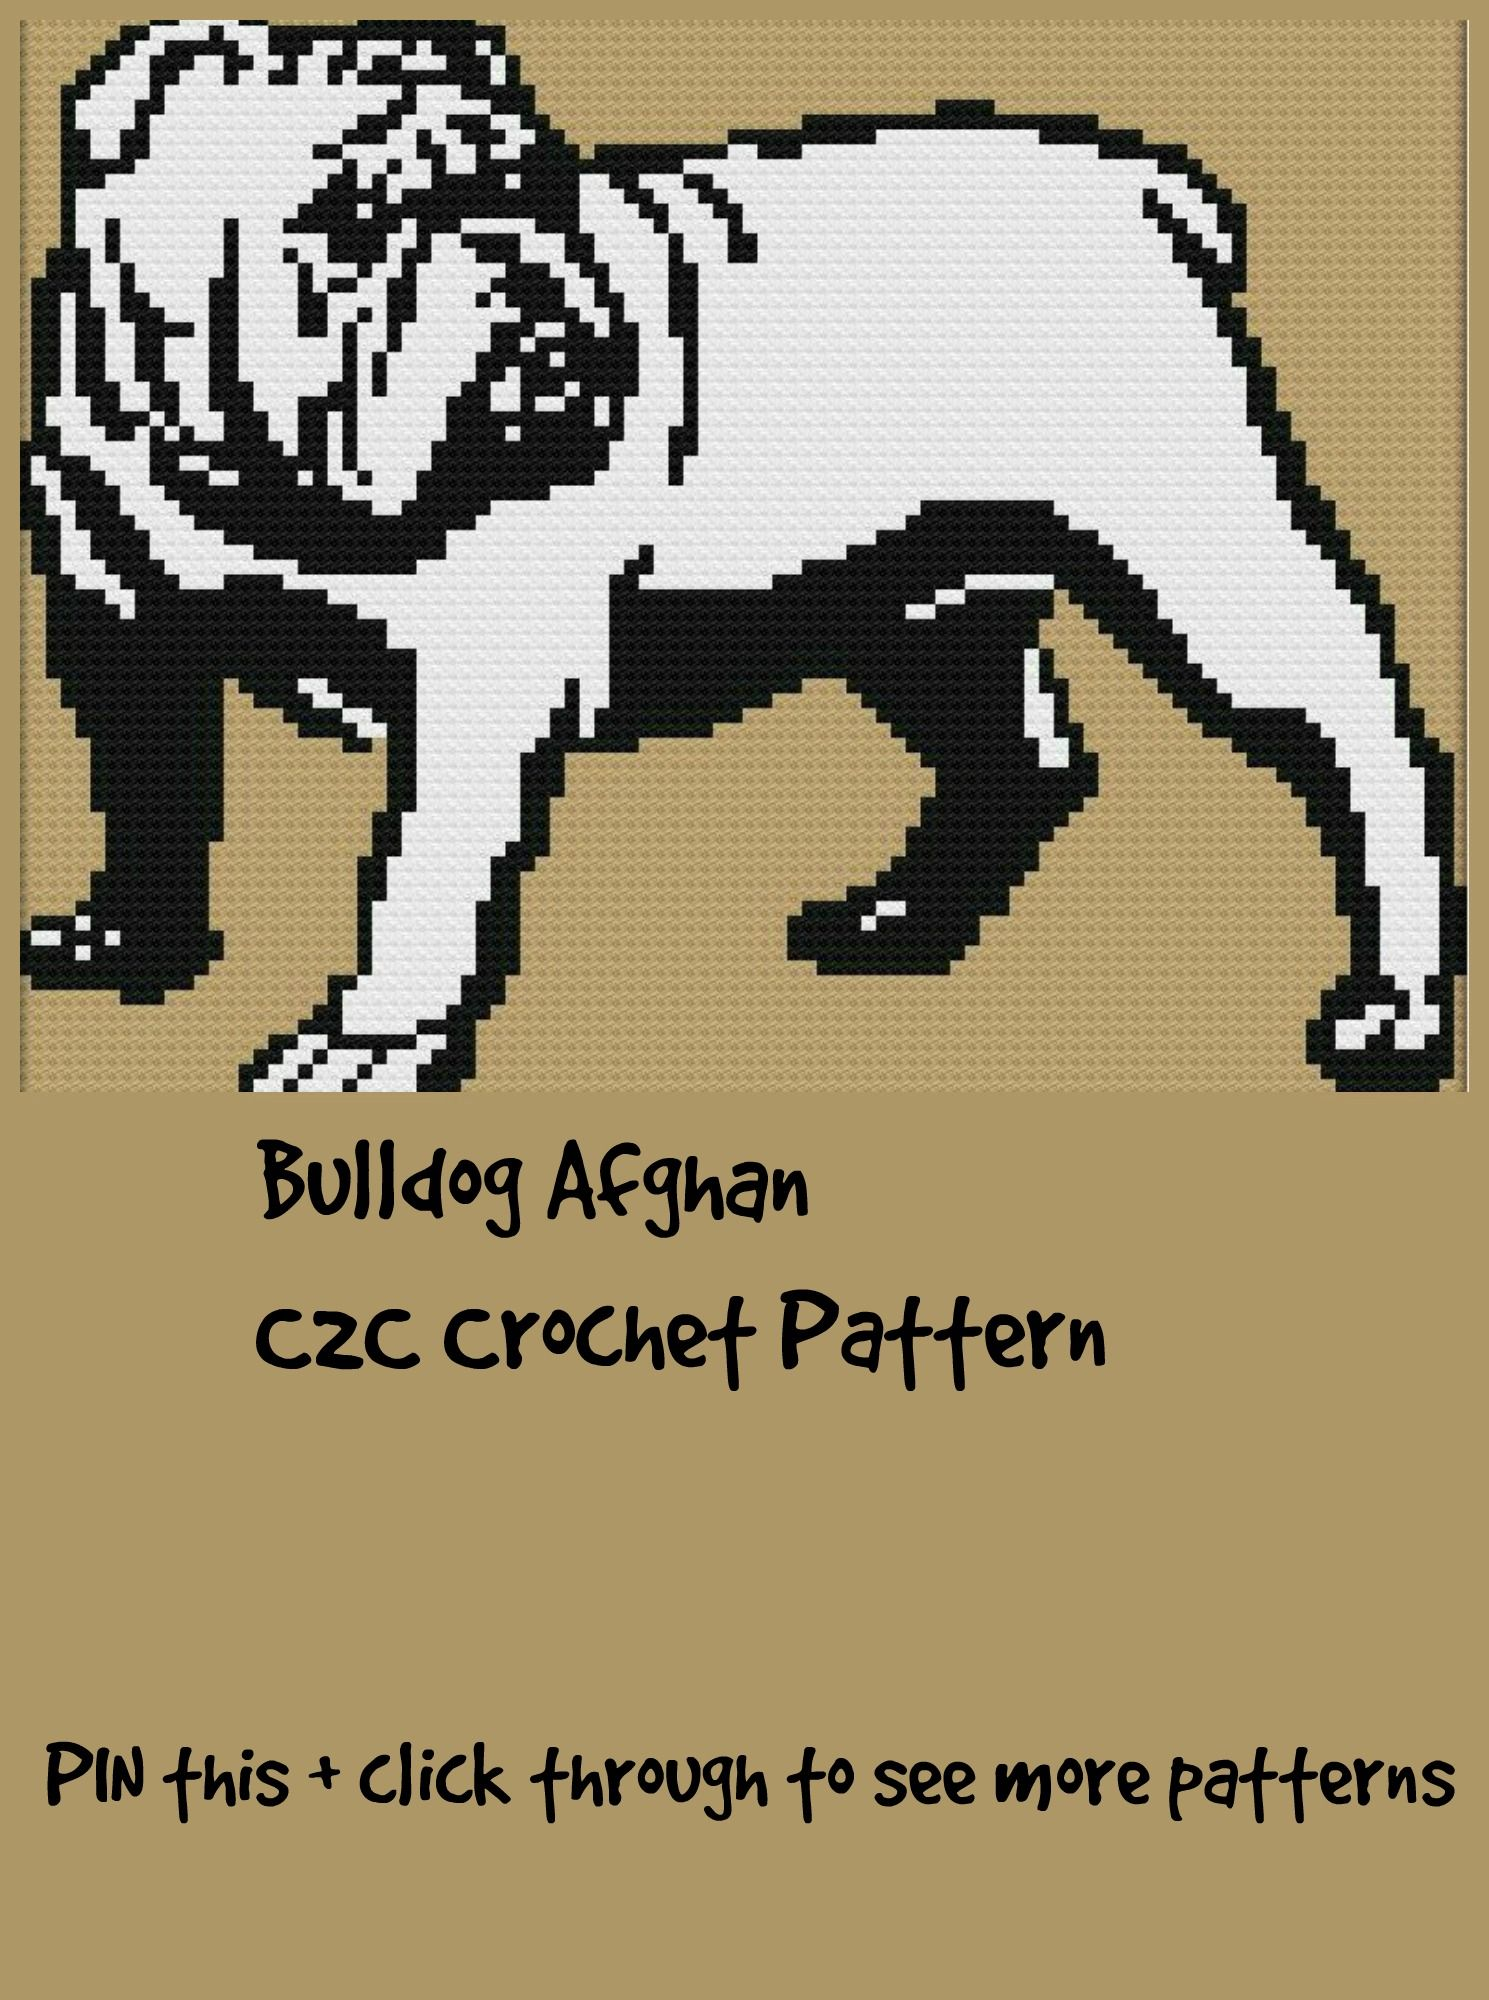 Bulldog Blanket, C2C Crochet Pattern, Written Row Counts